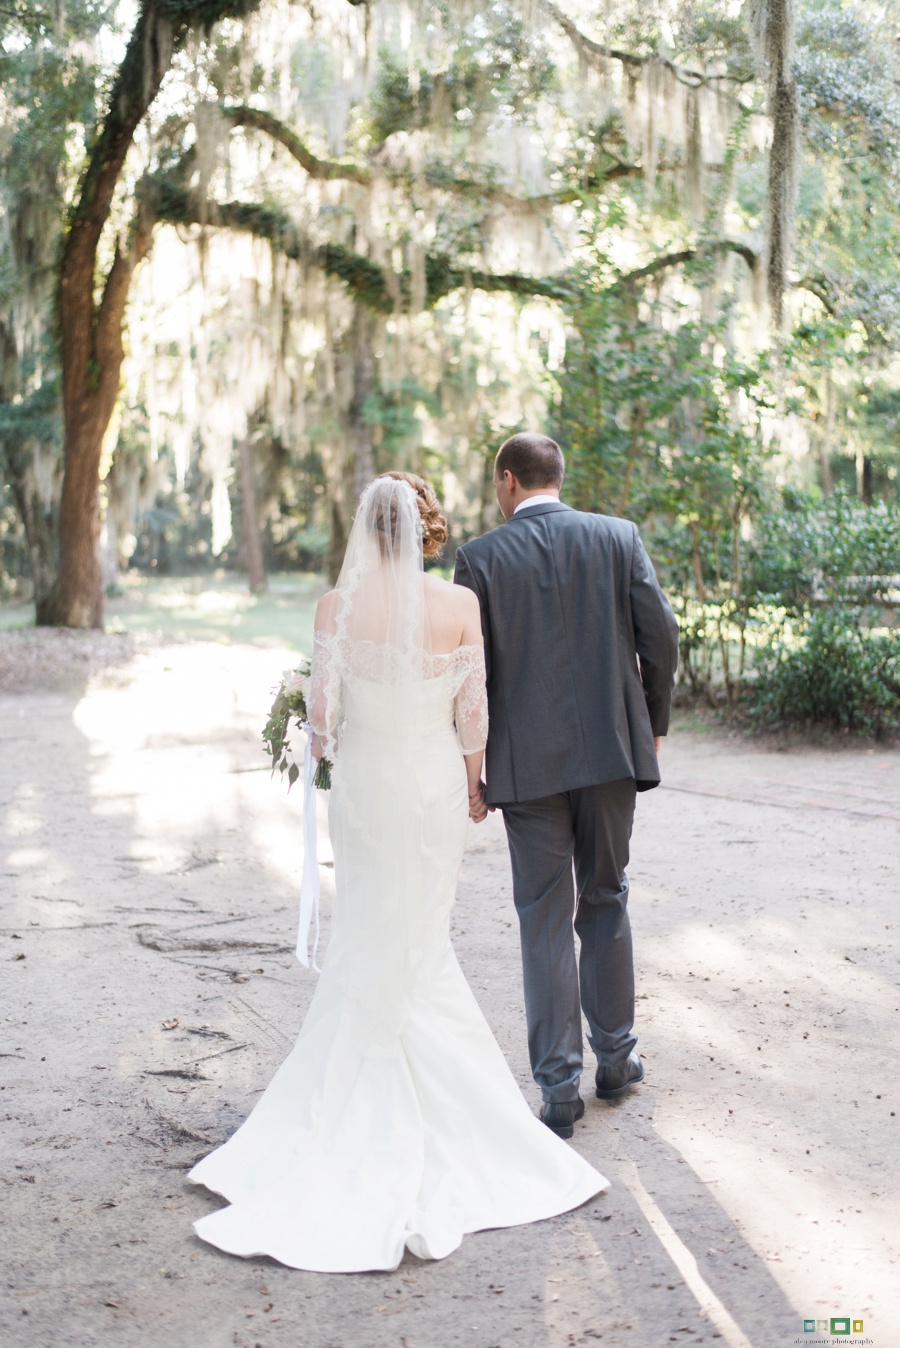 alea-moore-photography-Daufuskie-Island-wedding-ivory-and-beau-bridal-boutique-dakota-nicole-miller-rebecca-schoneveld-marisol-classic-southern-wedding-savannah-wedding-dresses-savannah-bridal-boutique-savannah-weddings-savannah-bridal-gowns-8.jpg